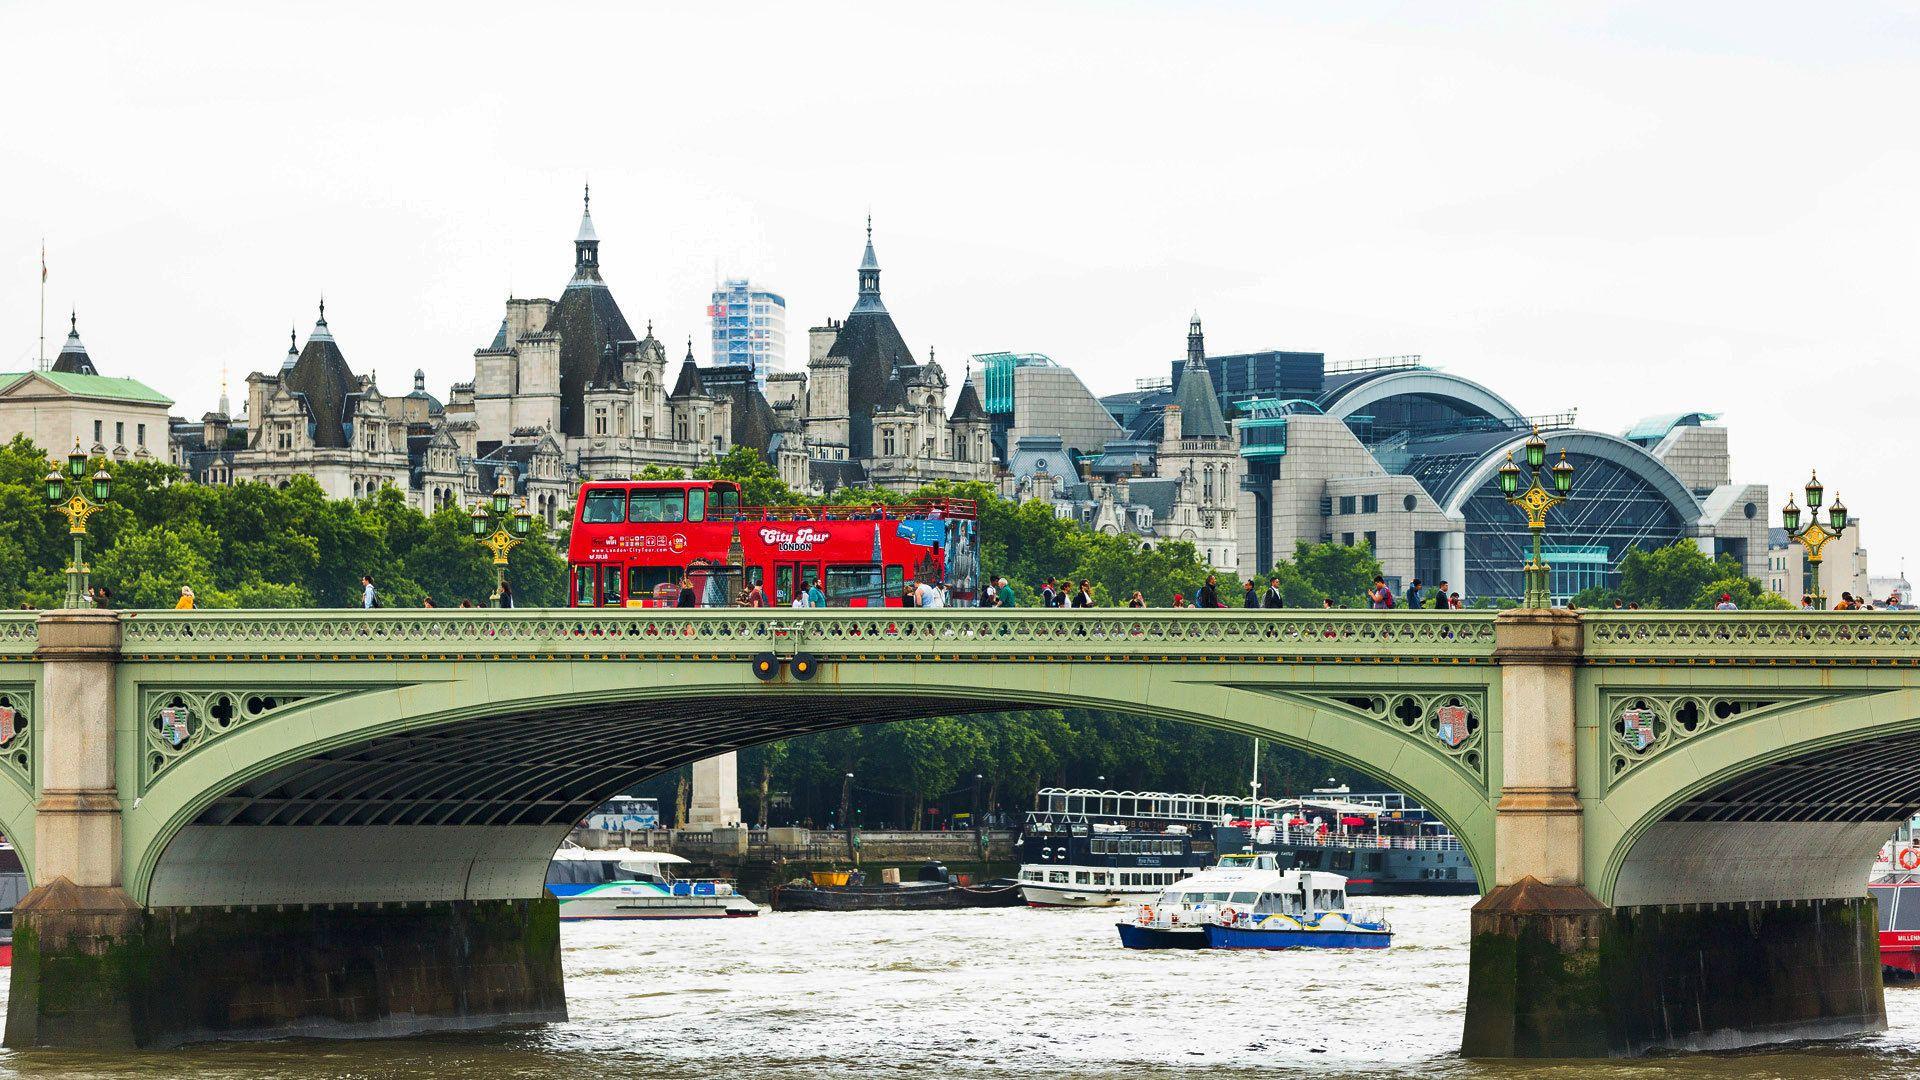 View of double decker tour bus on bridge in London